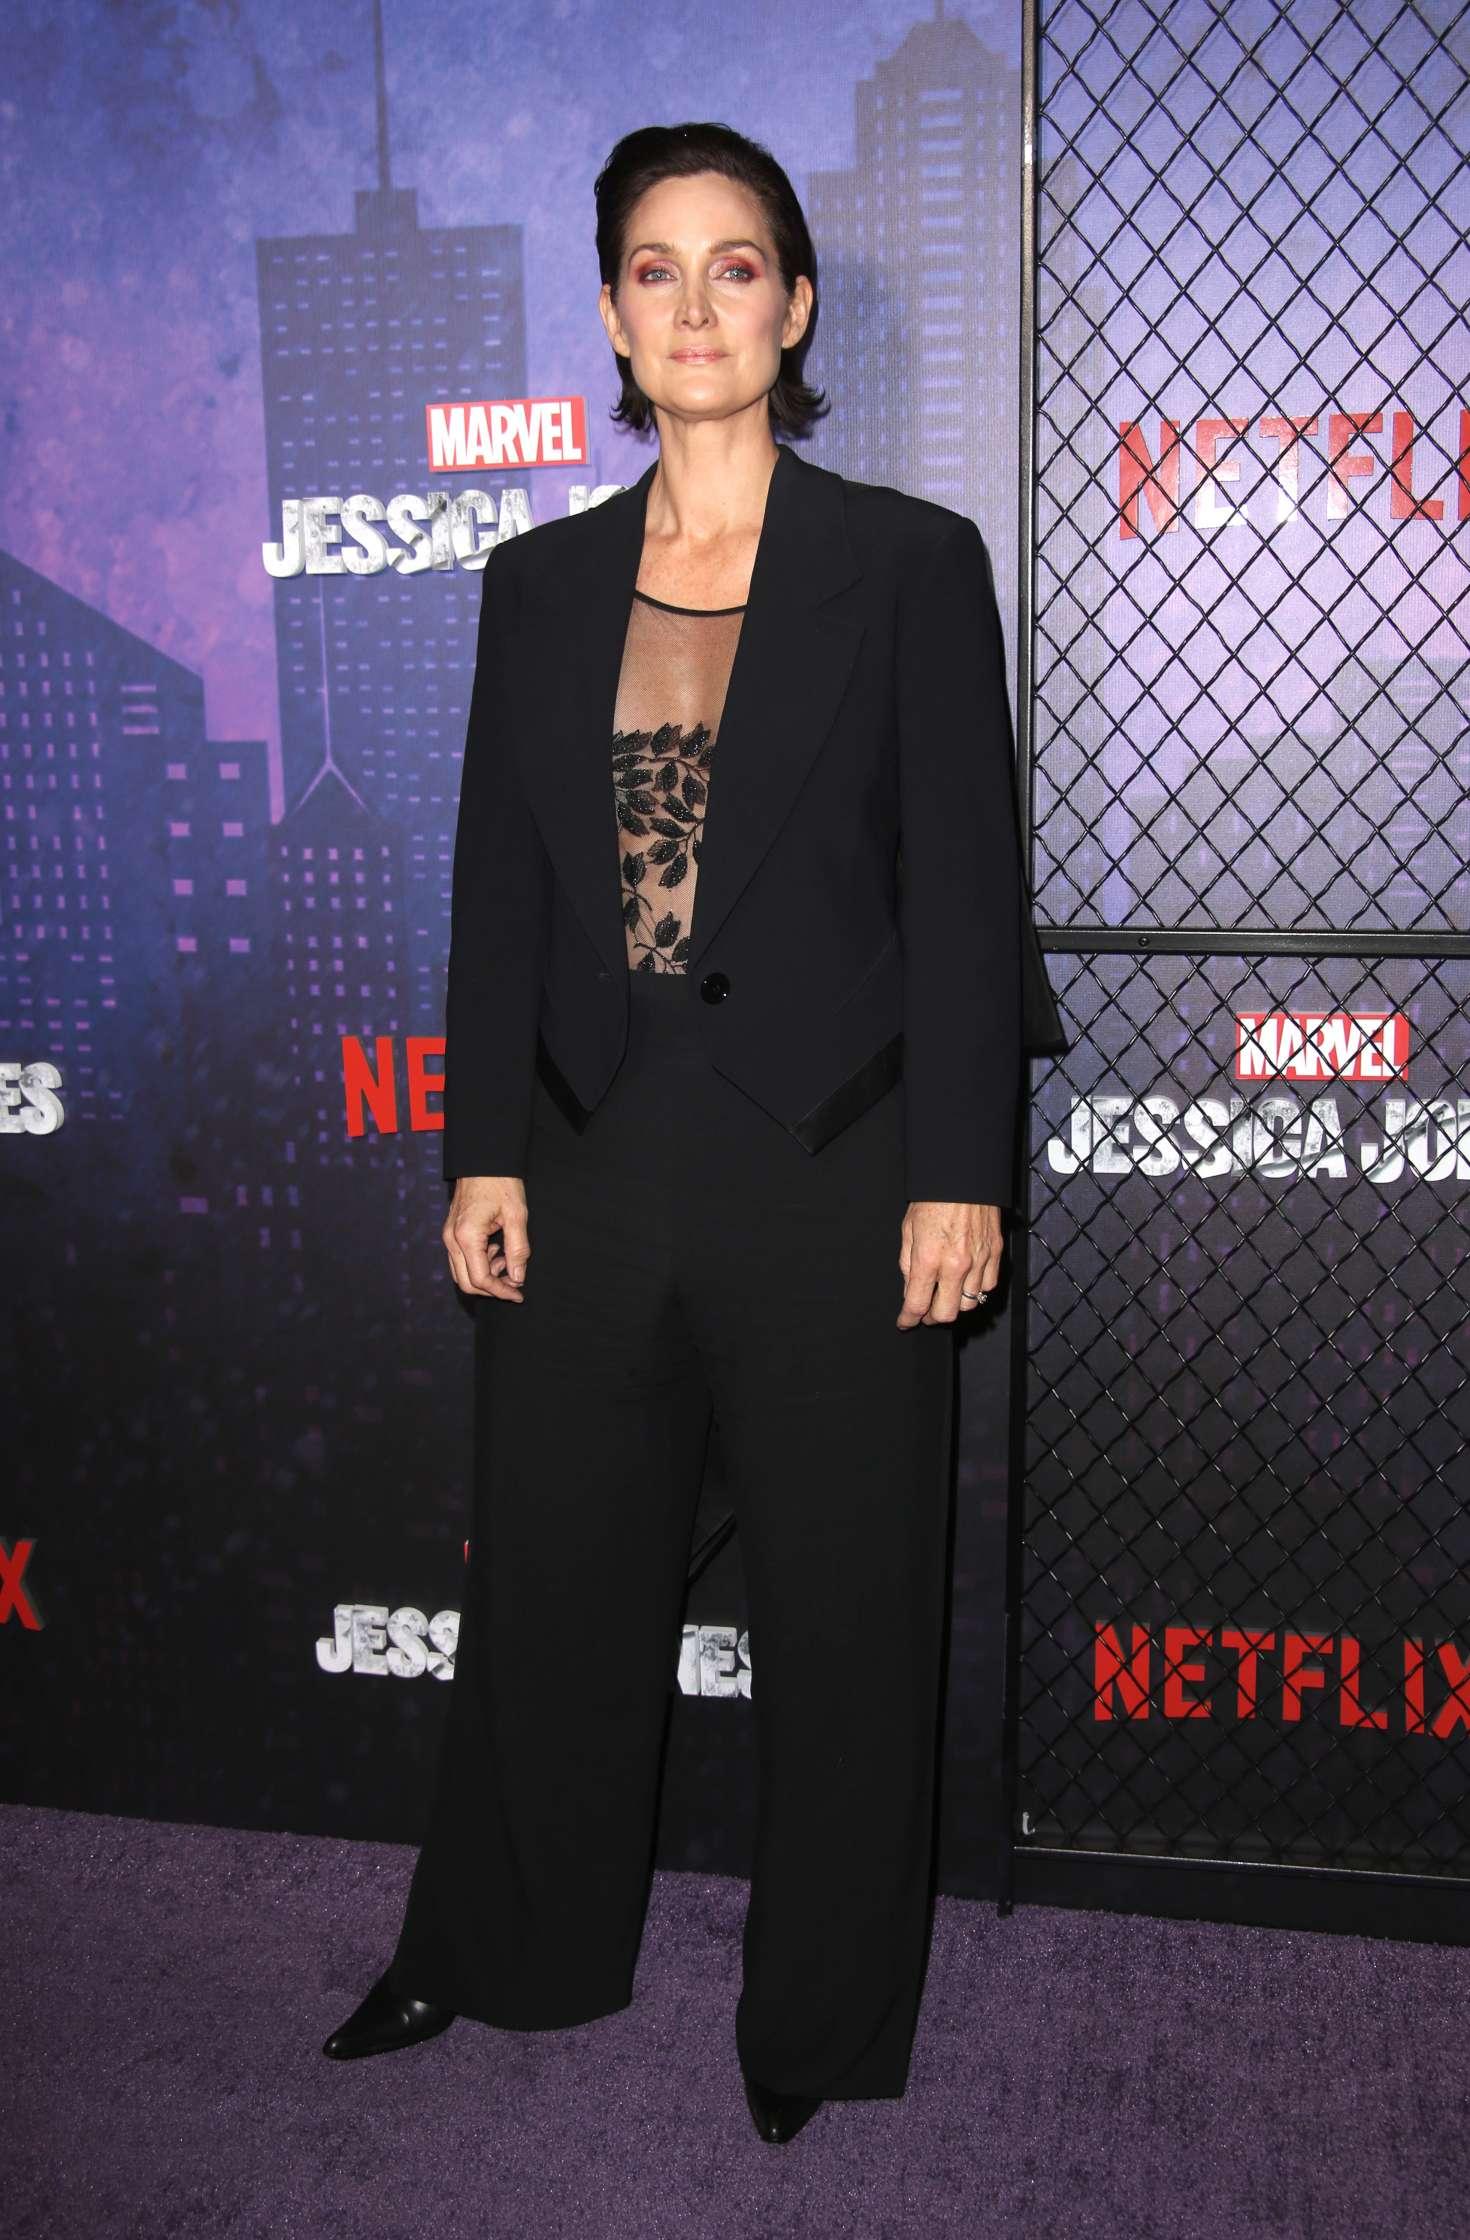 Carrie-Anne Moss - 'Jessica Jones' Season 2 Premiere in New York